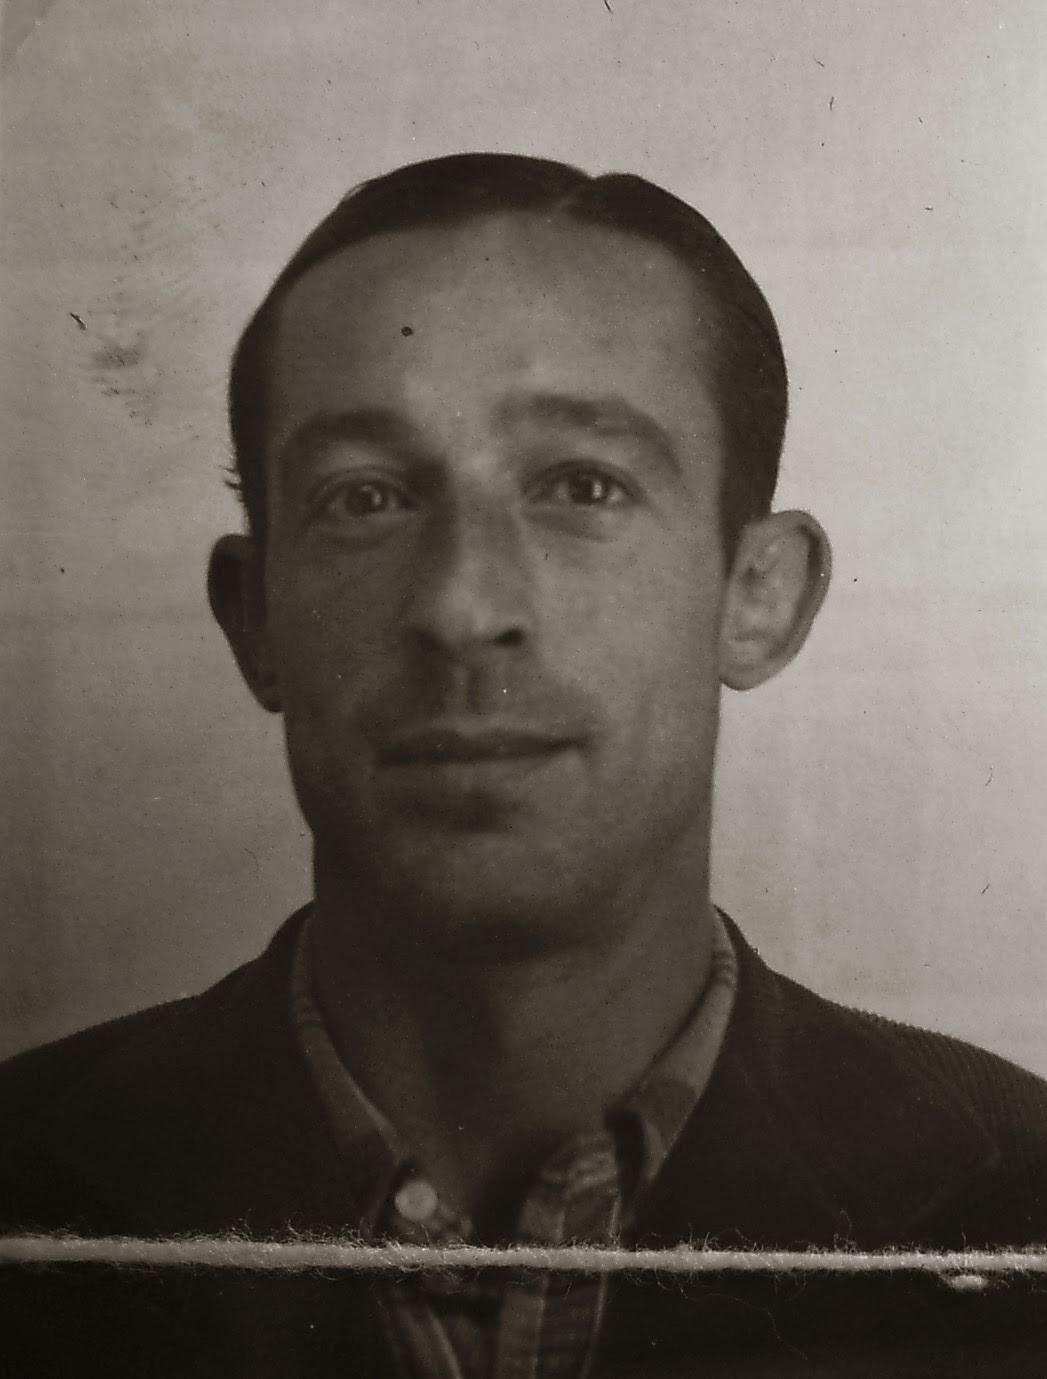 BUENO, JUSTO (1907-1944)